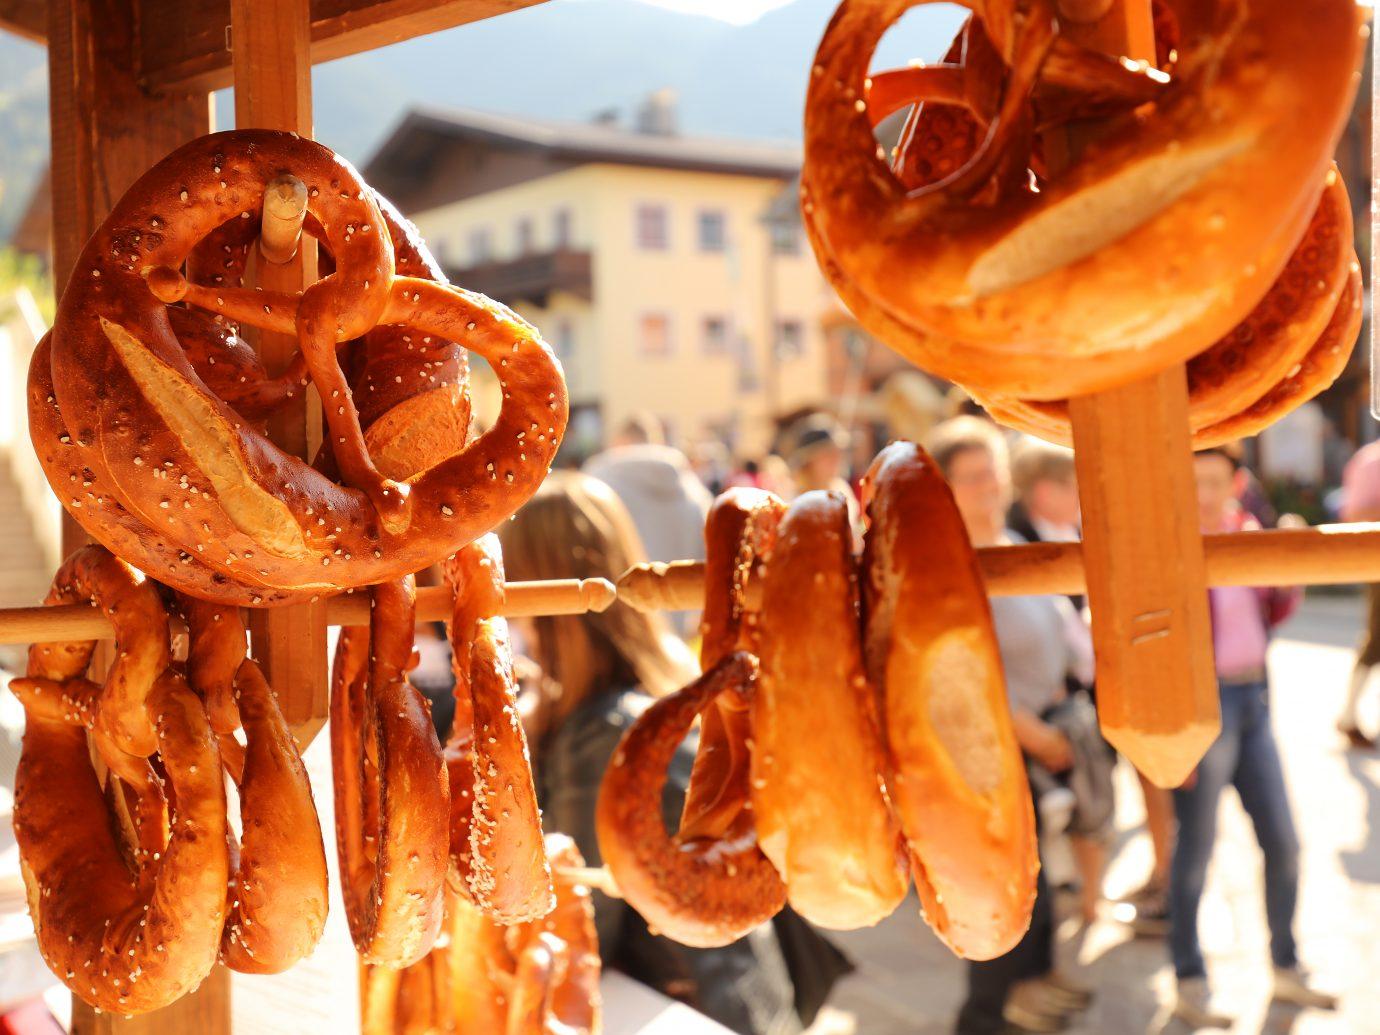 Soft pretzels for sale at a market